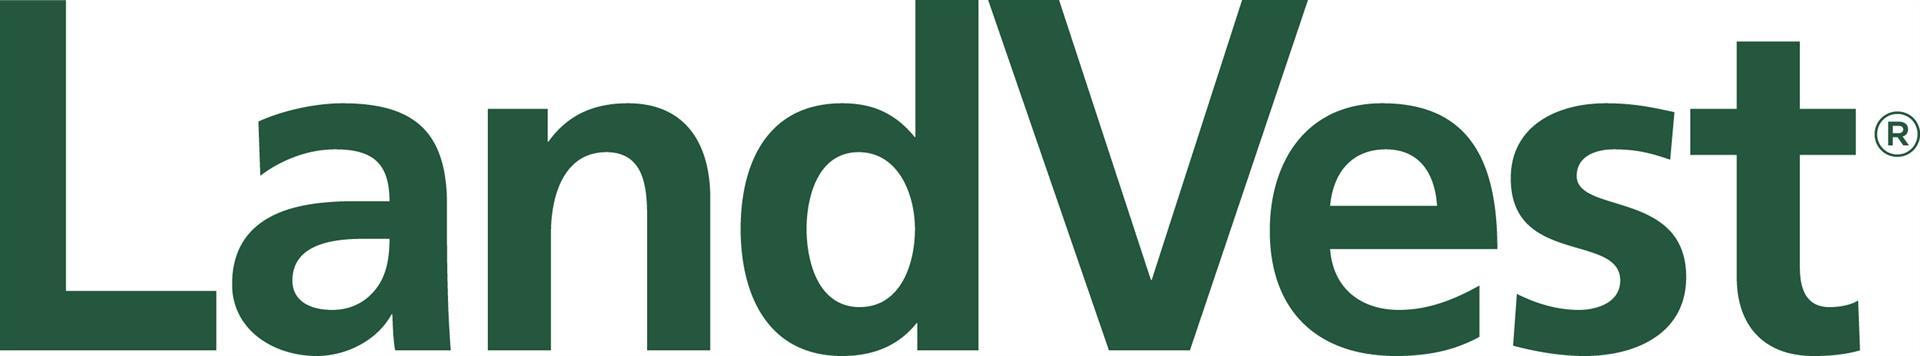 LandVest Logo.jpg